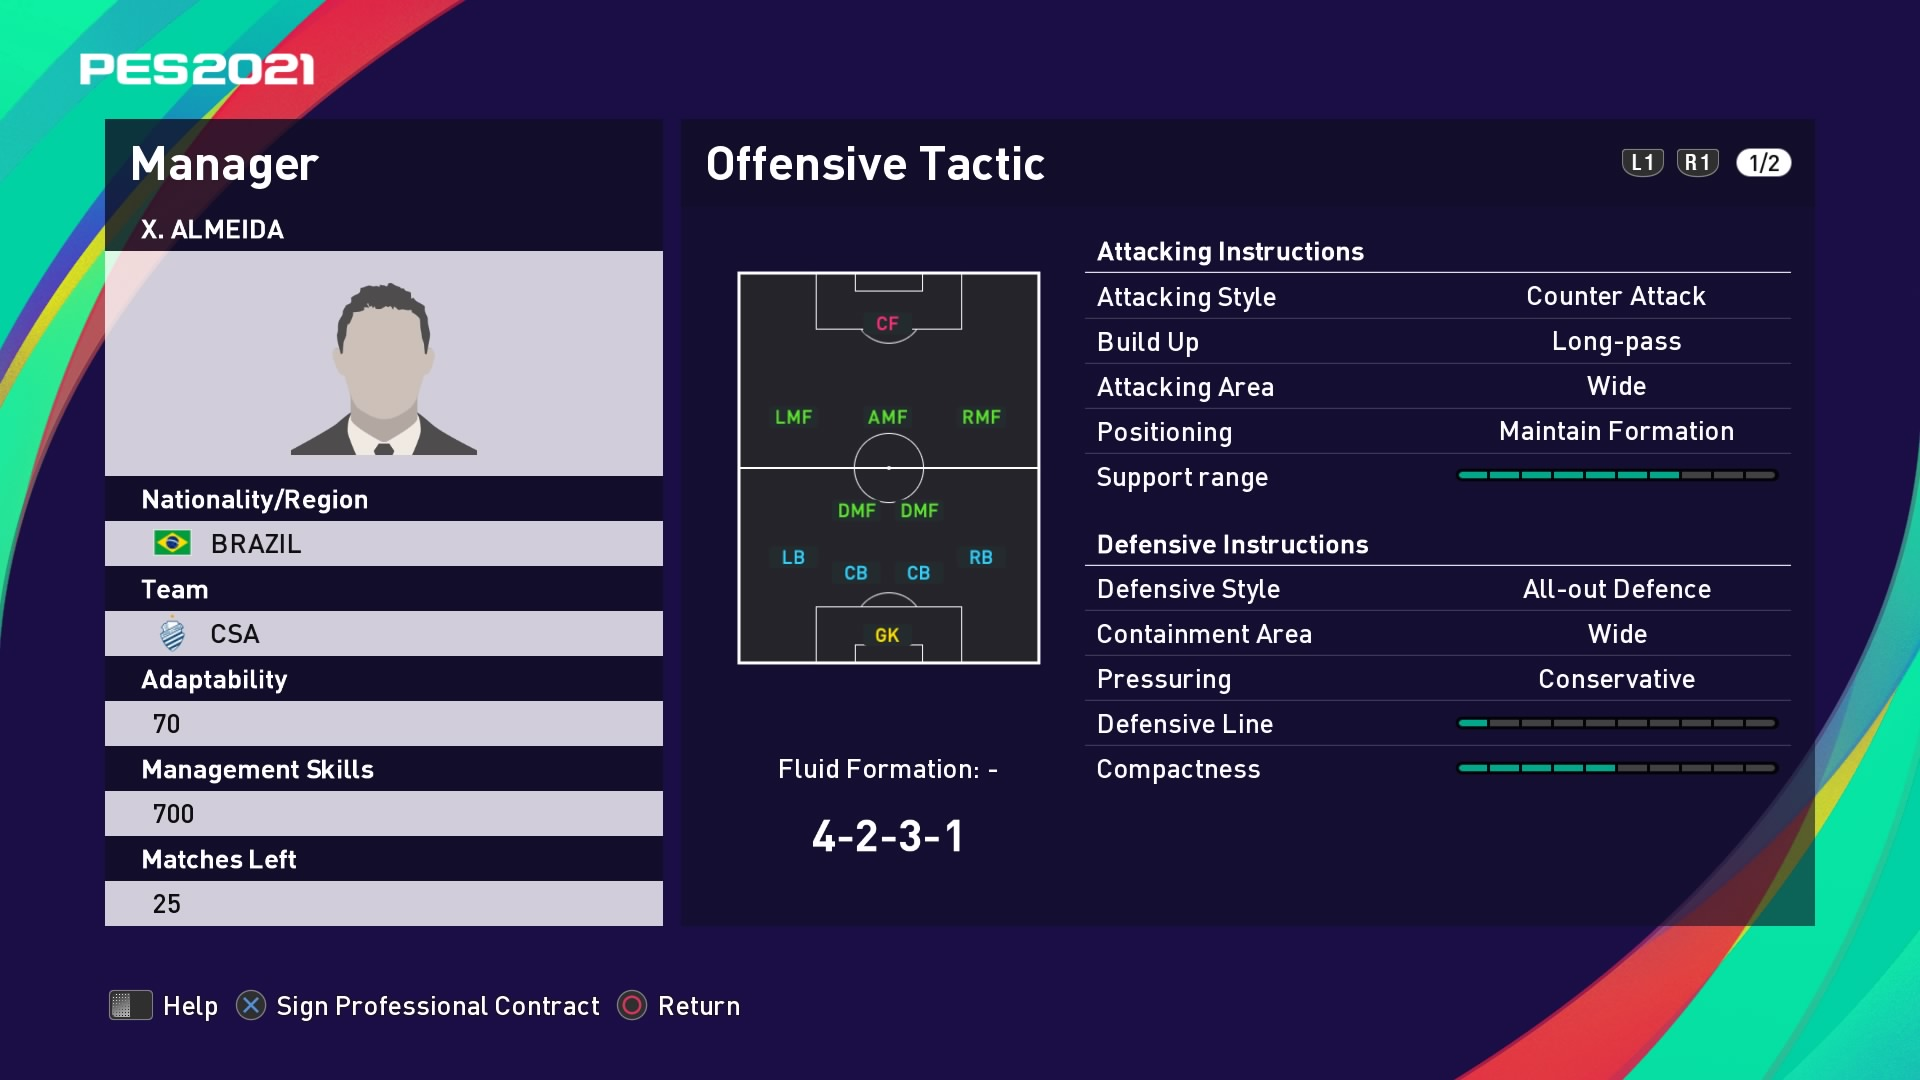 X. Almeida (Mozart Batista) Offensive Tactic in PES 2021 myClub